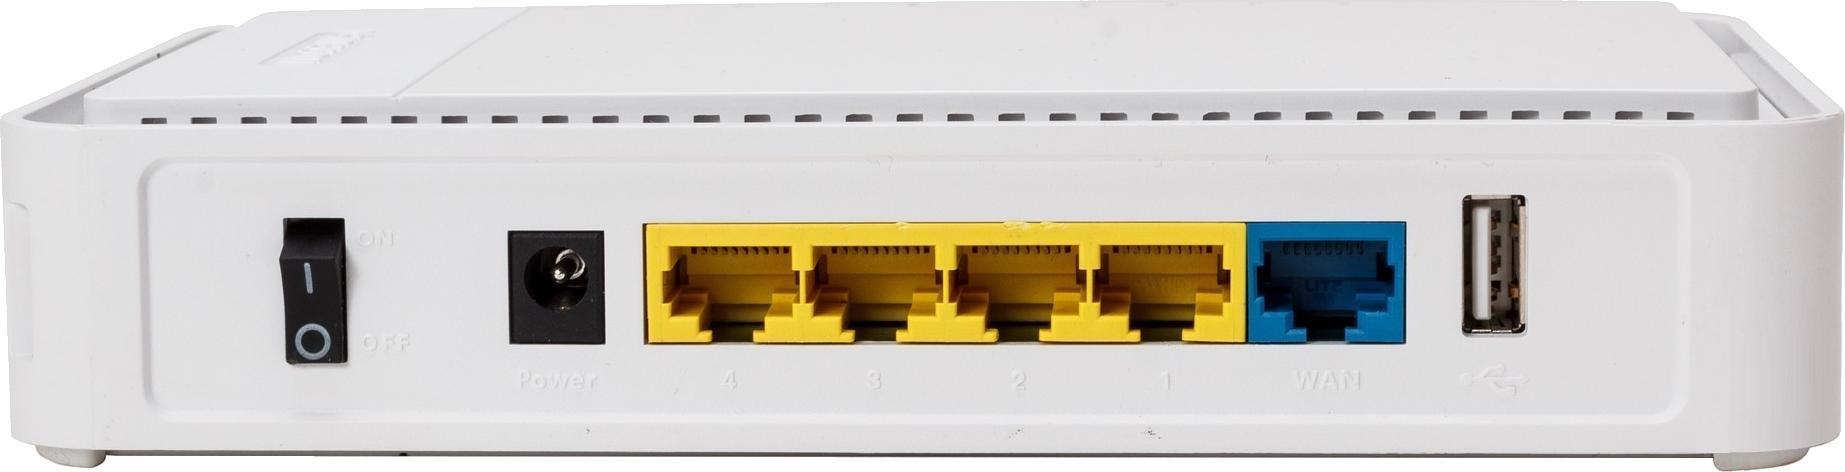 Sitecom WLR-7100